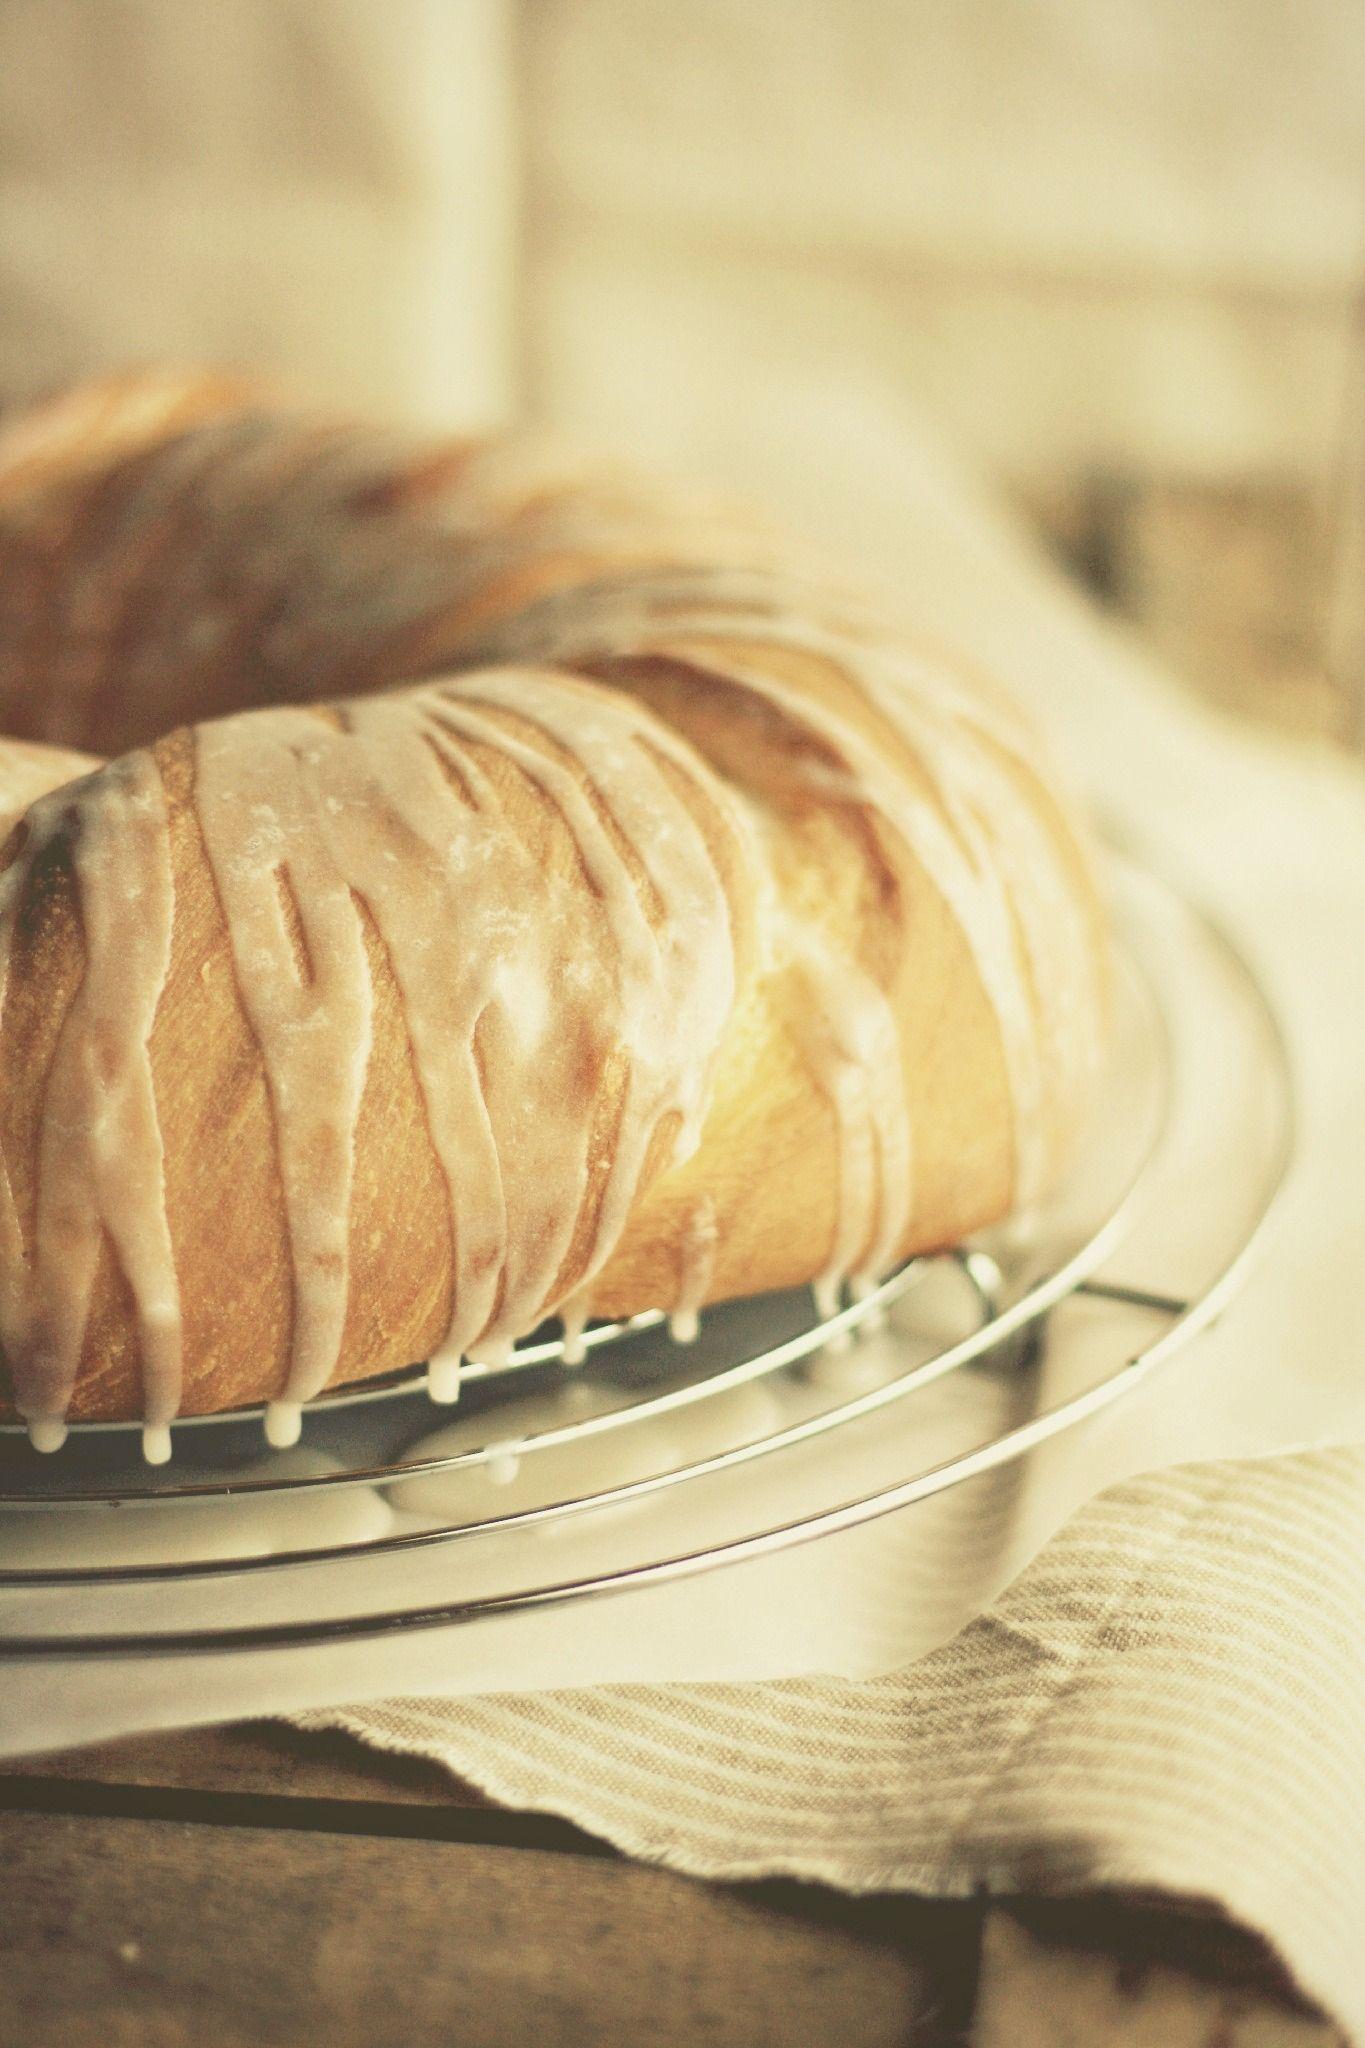 Sweet bread - Copyright 2012 Sarah Brunella